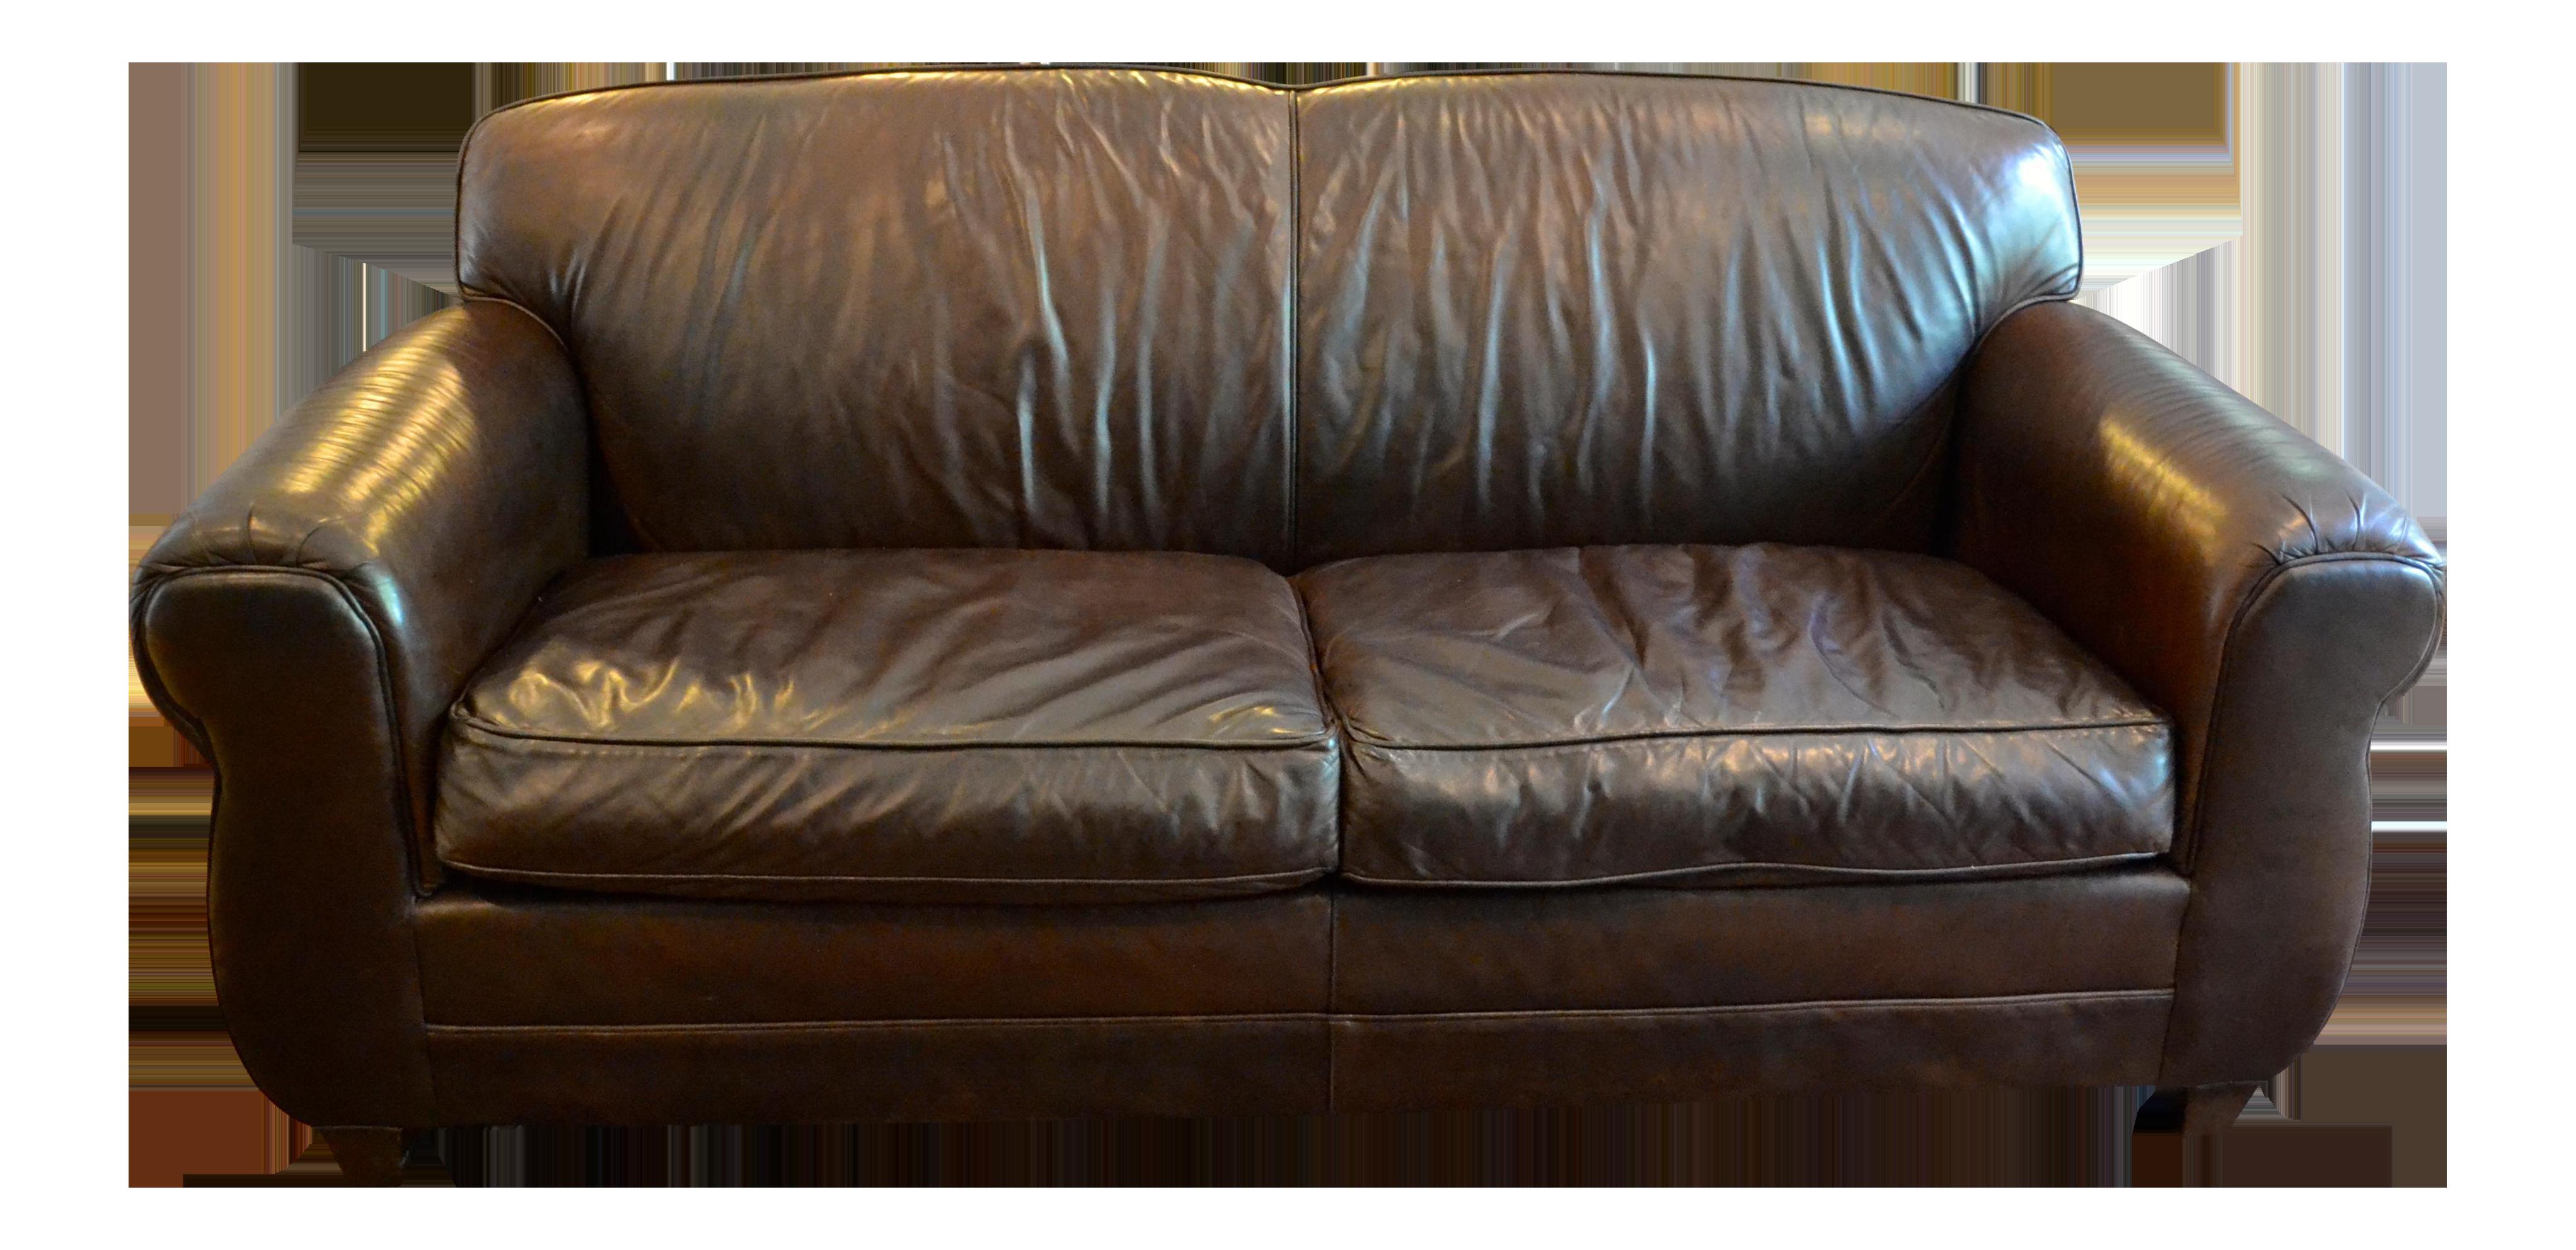 restoration hardware morgan leather loveseat